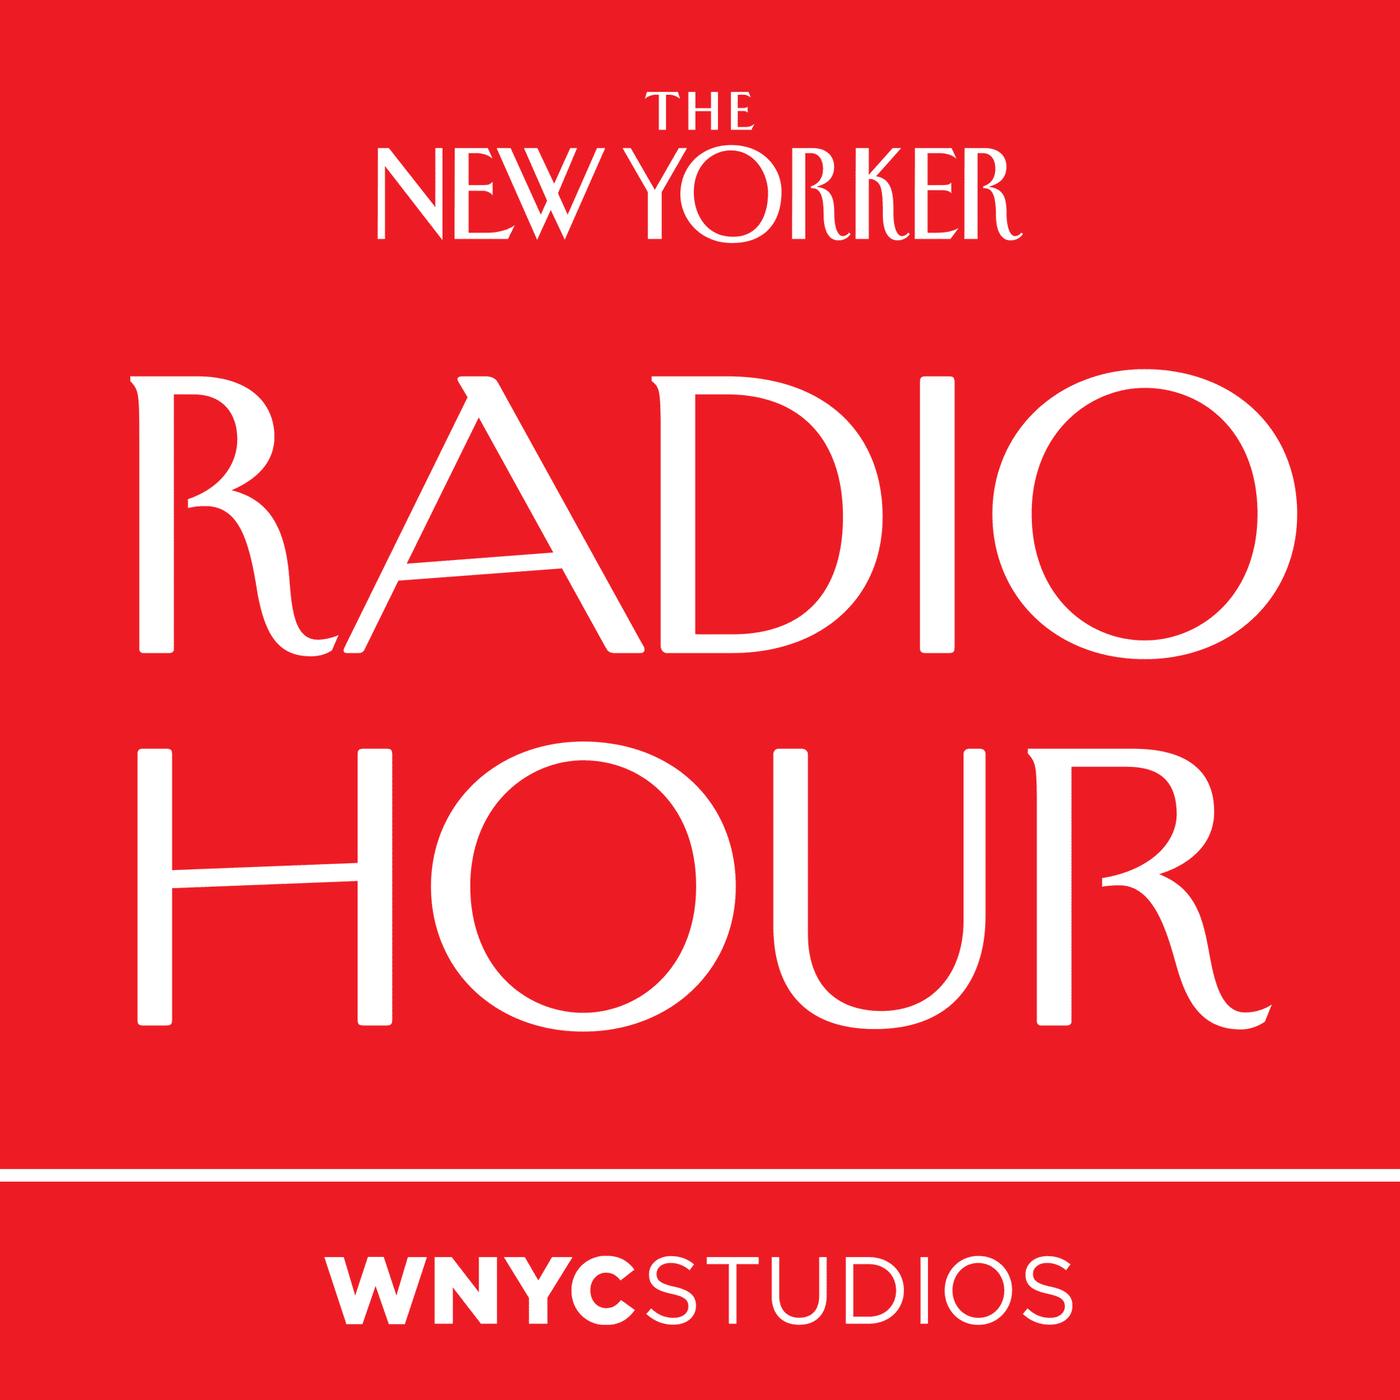 The New Yorker Radio Hour : NPR